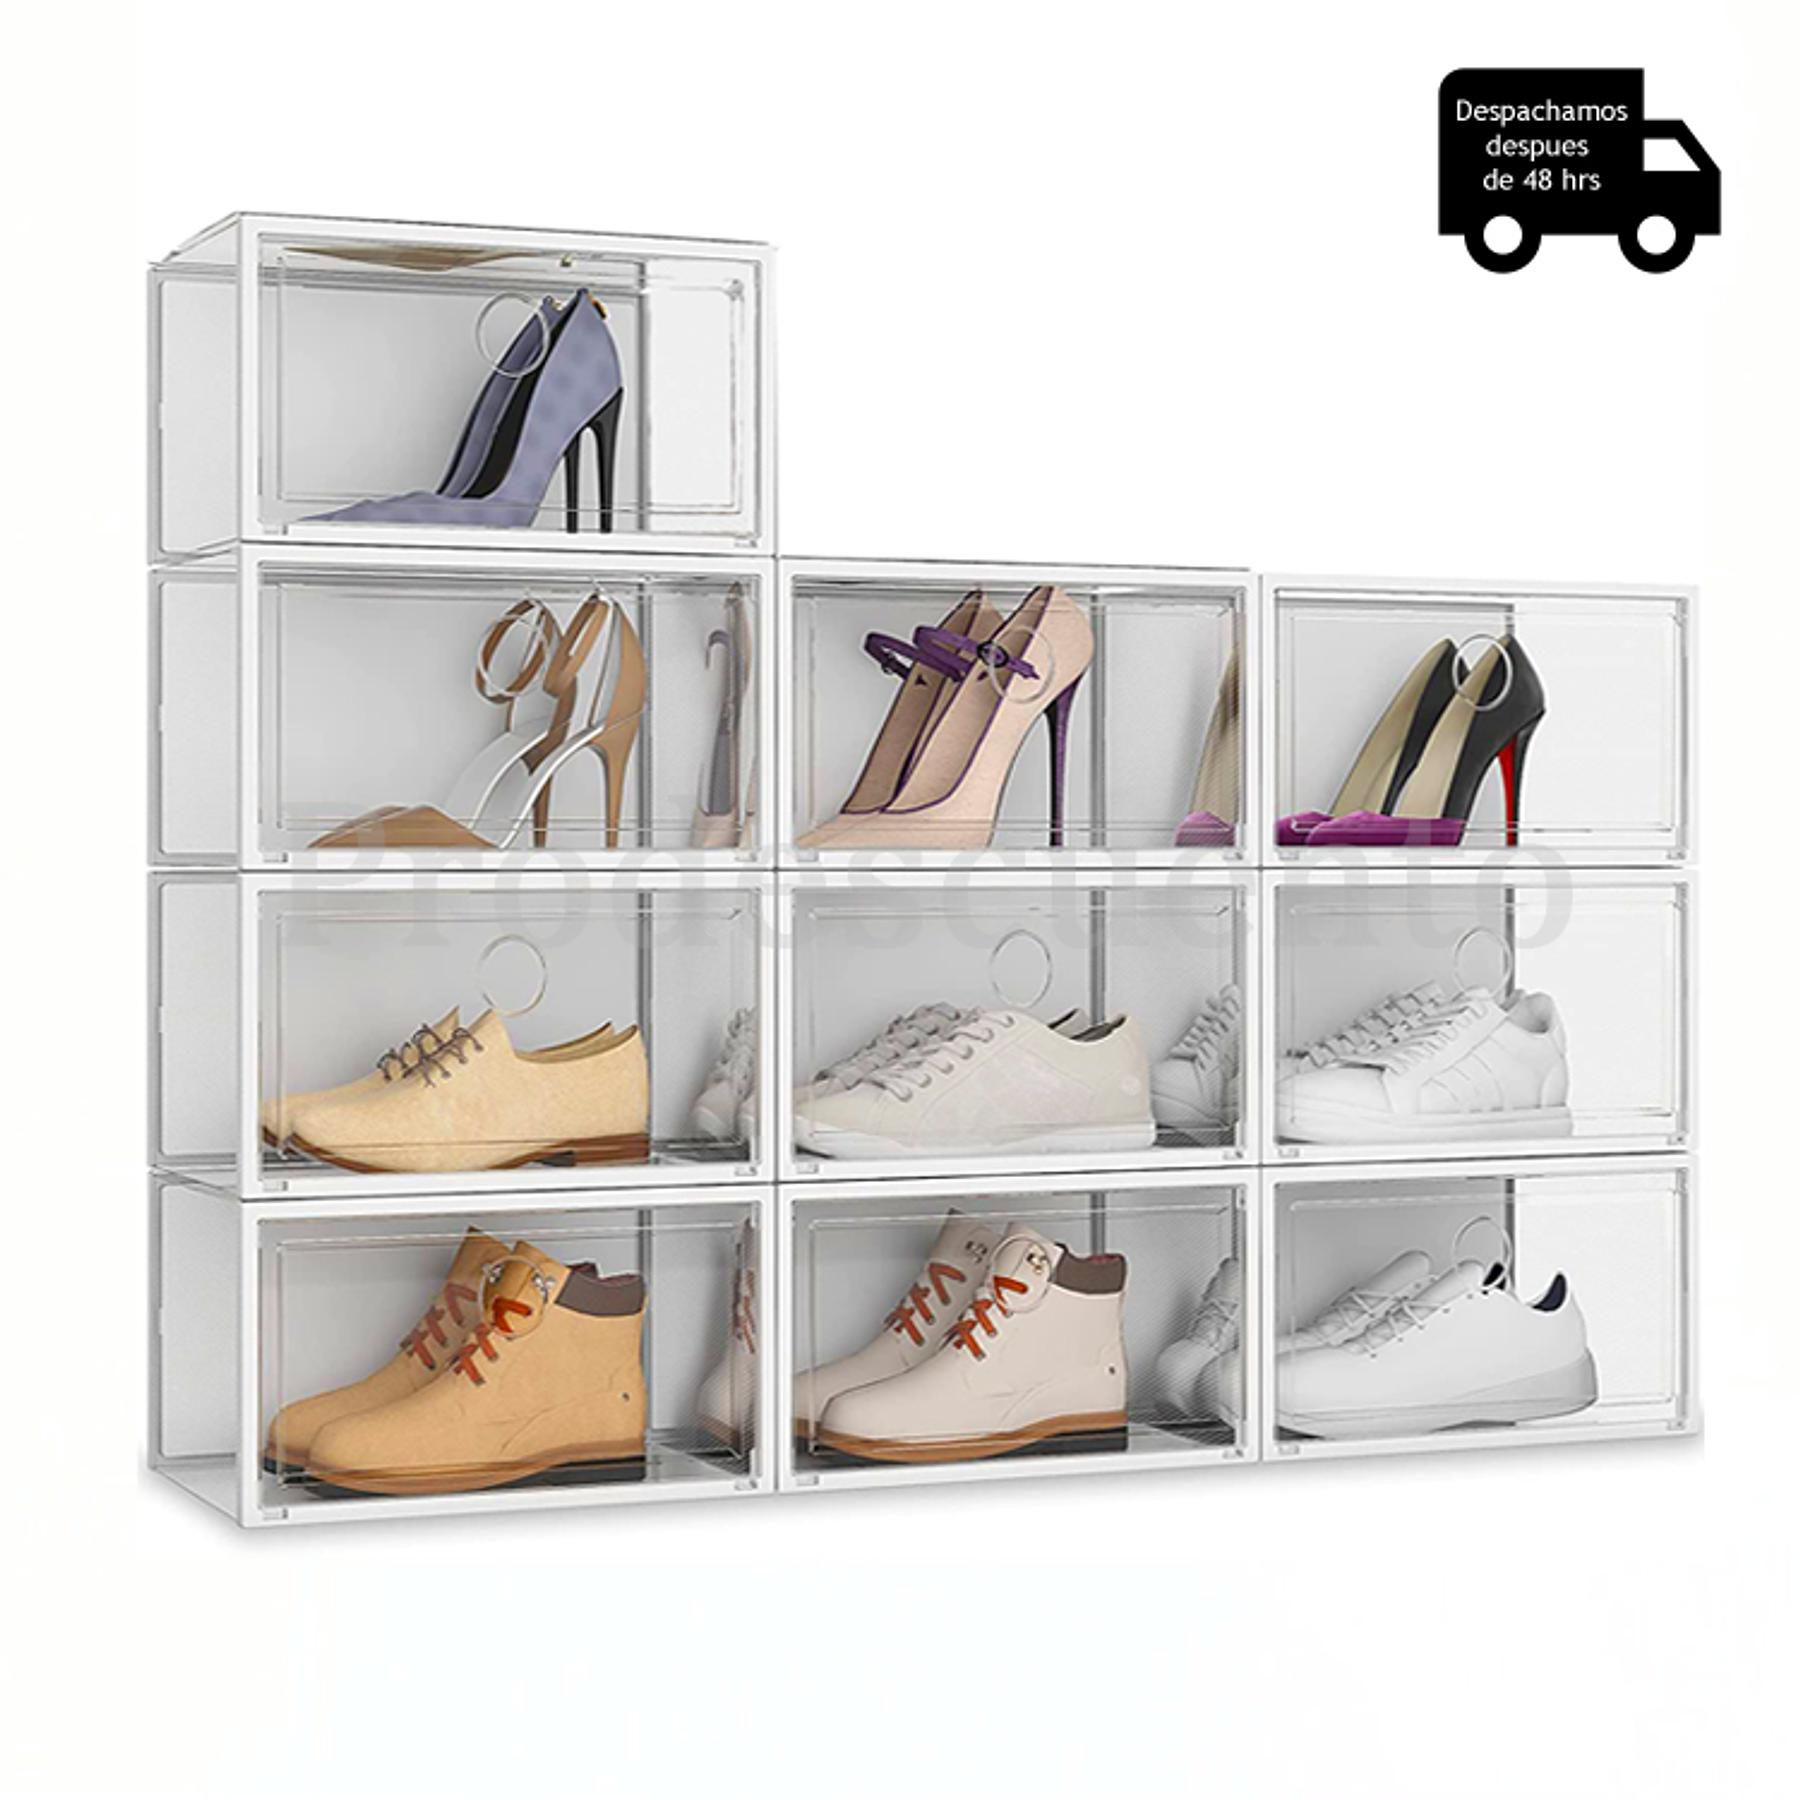 Pack De 10 Cajas De Almacenamiento Transparentes Para Zapatos